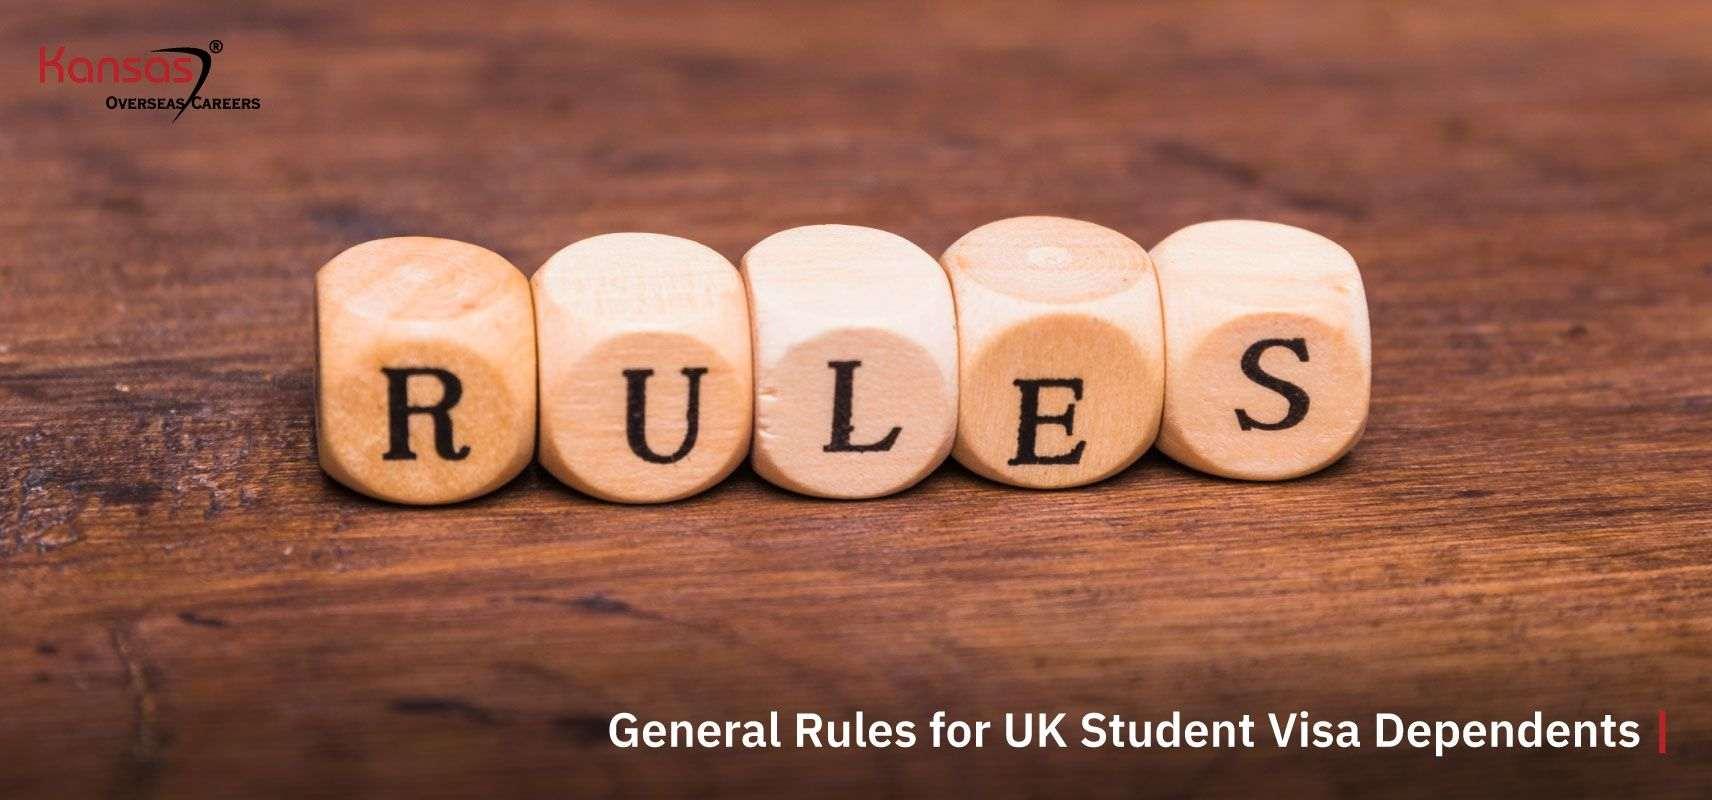 General-Rules-for-UK-Student-Visa-Dependents